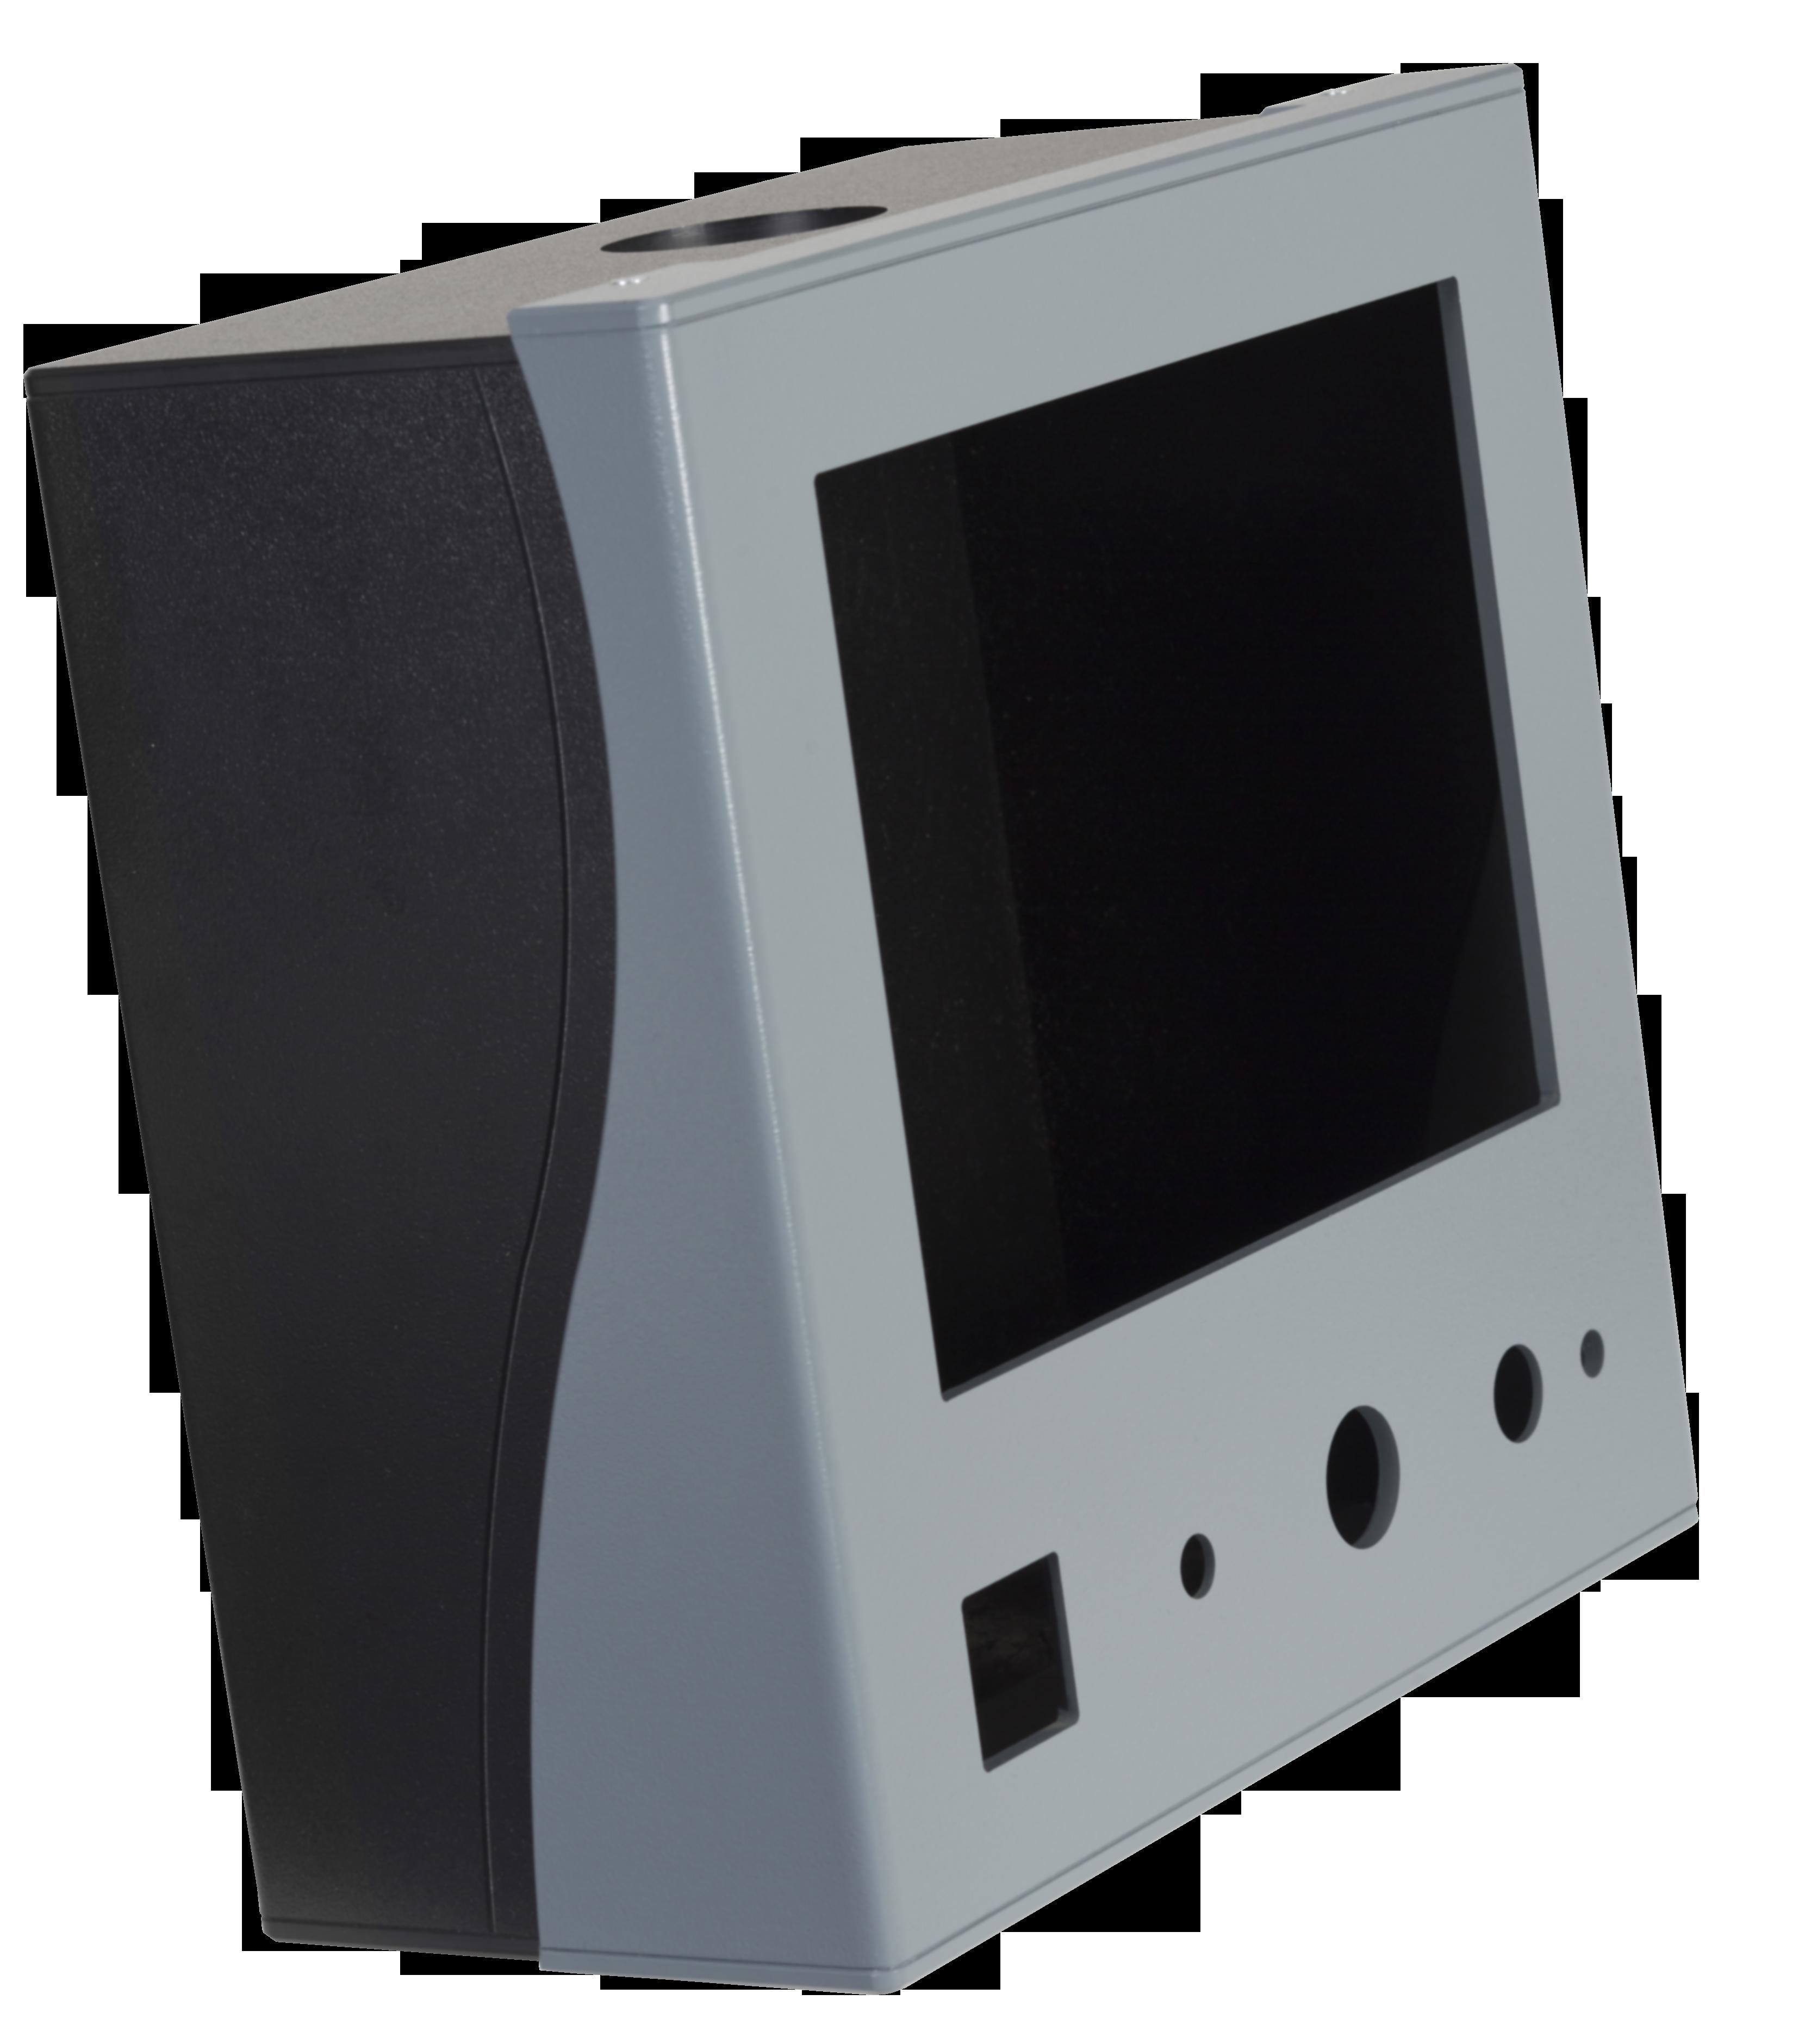 Fabricated Plastic Hmi Box Smartboxx